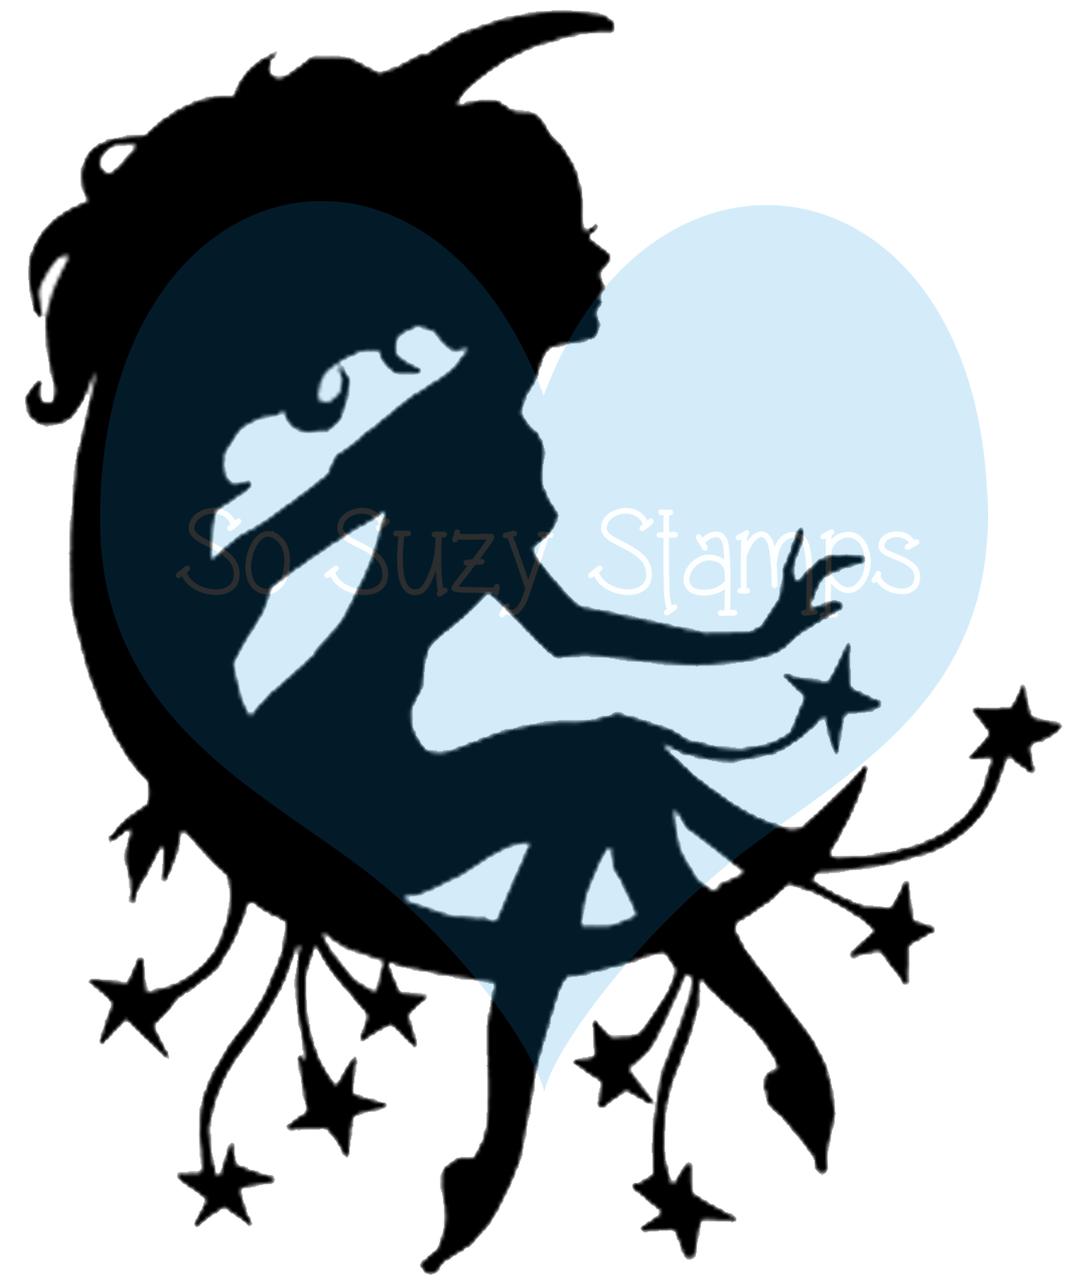 http://www.sosuzystamps.com/moon-fairy/